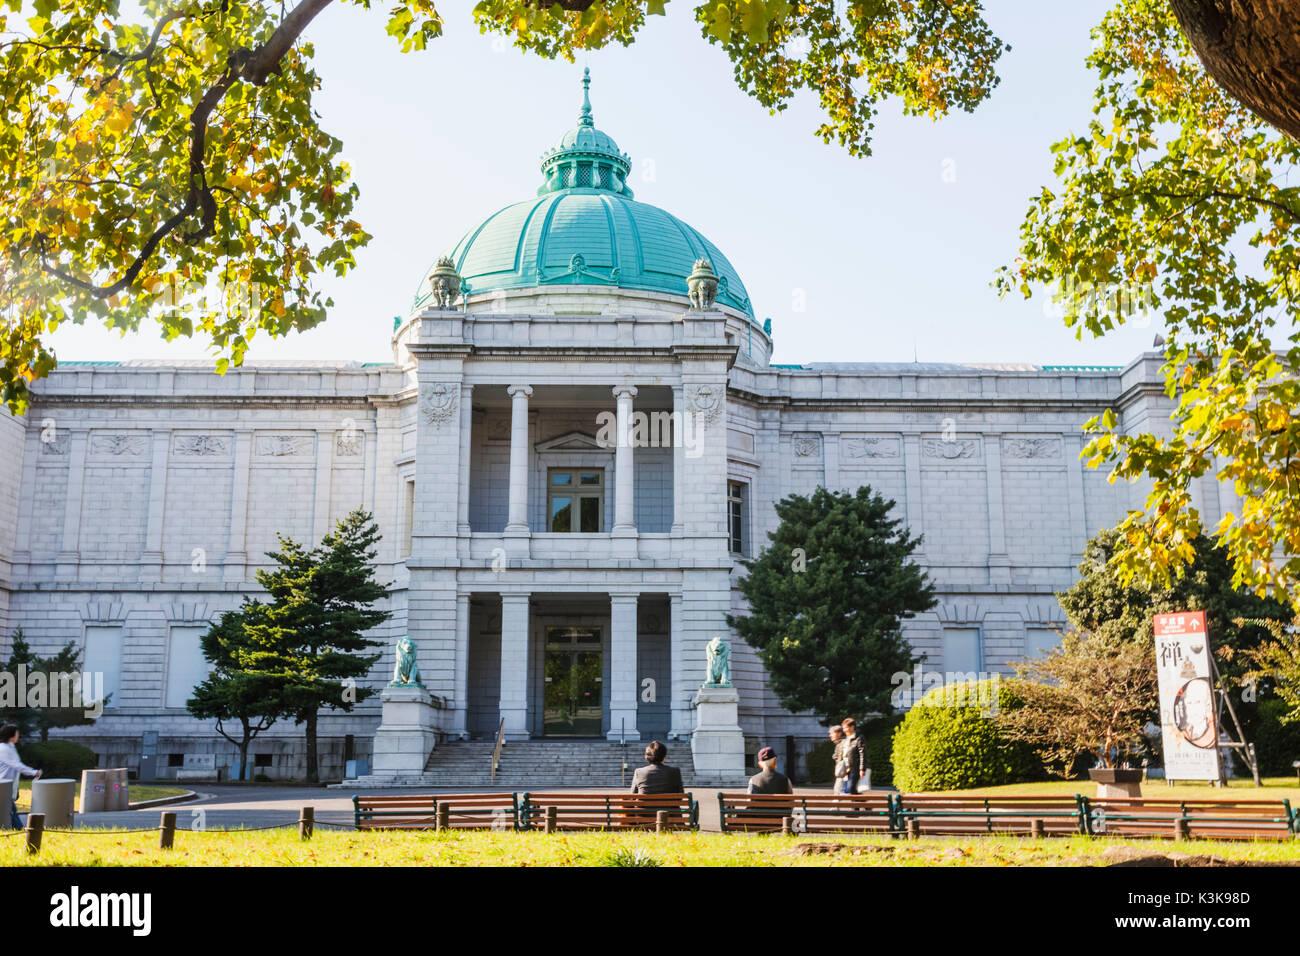 Japan, Hoshu, Tokyo, Ueno Park, Tokyo National Museum, Hyokeikan Hall - Stock Image